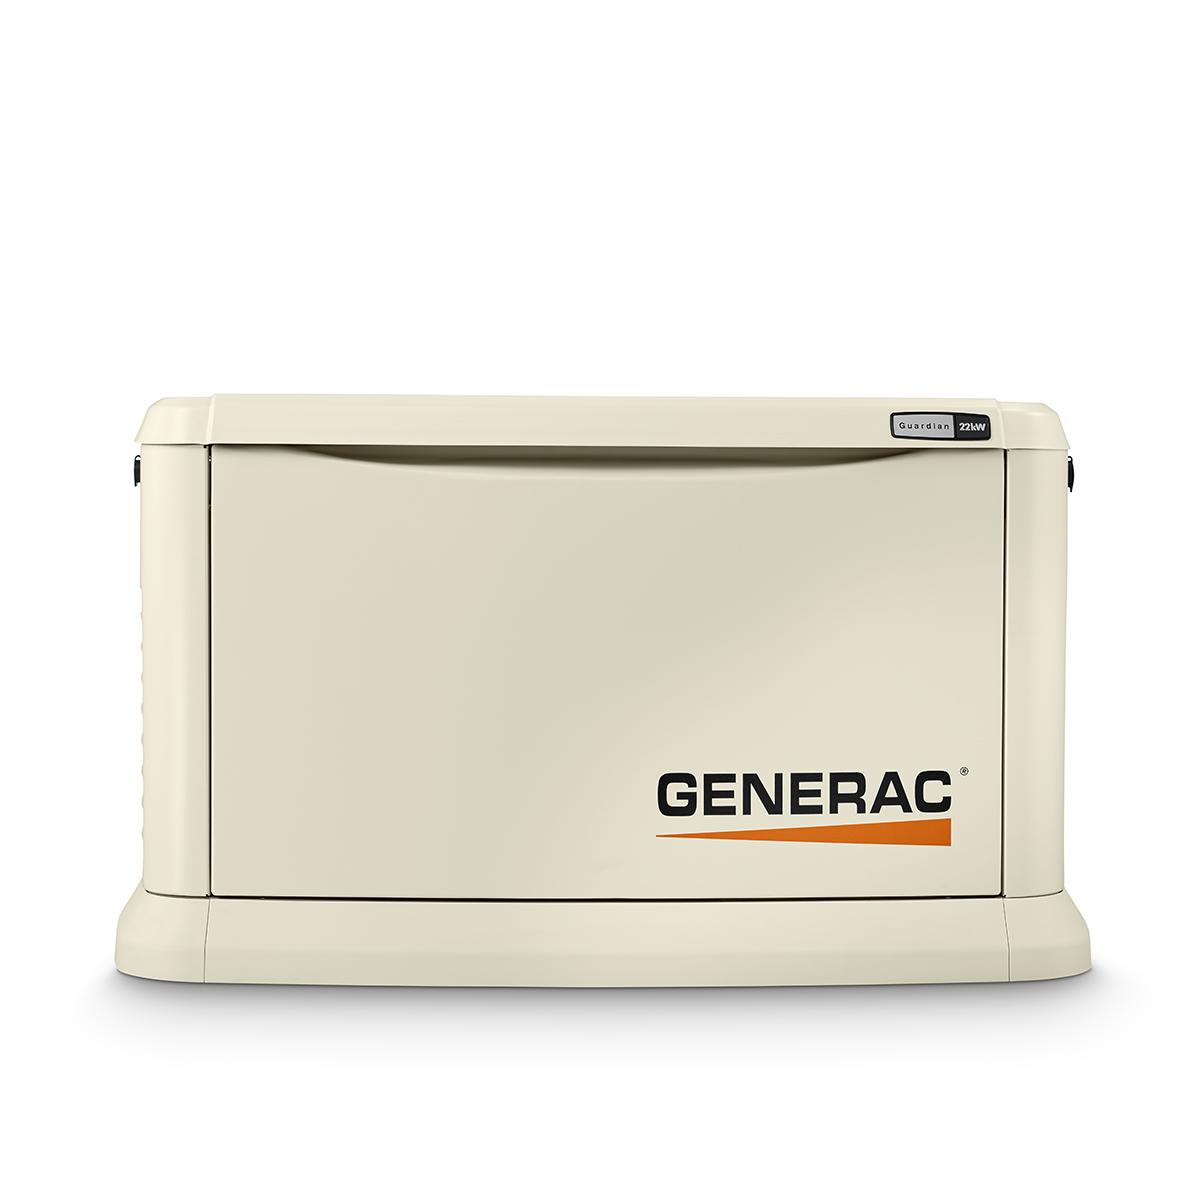 Generac 7037 16kW Home Standby Generator | Gentek Power LLC